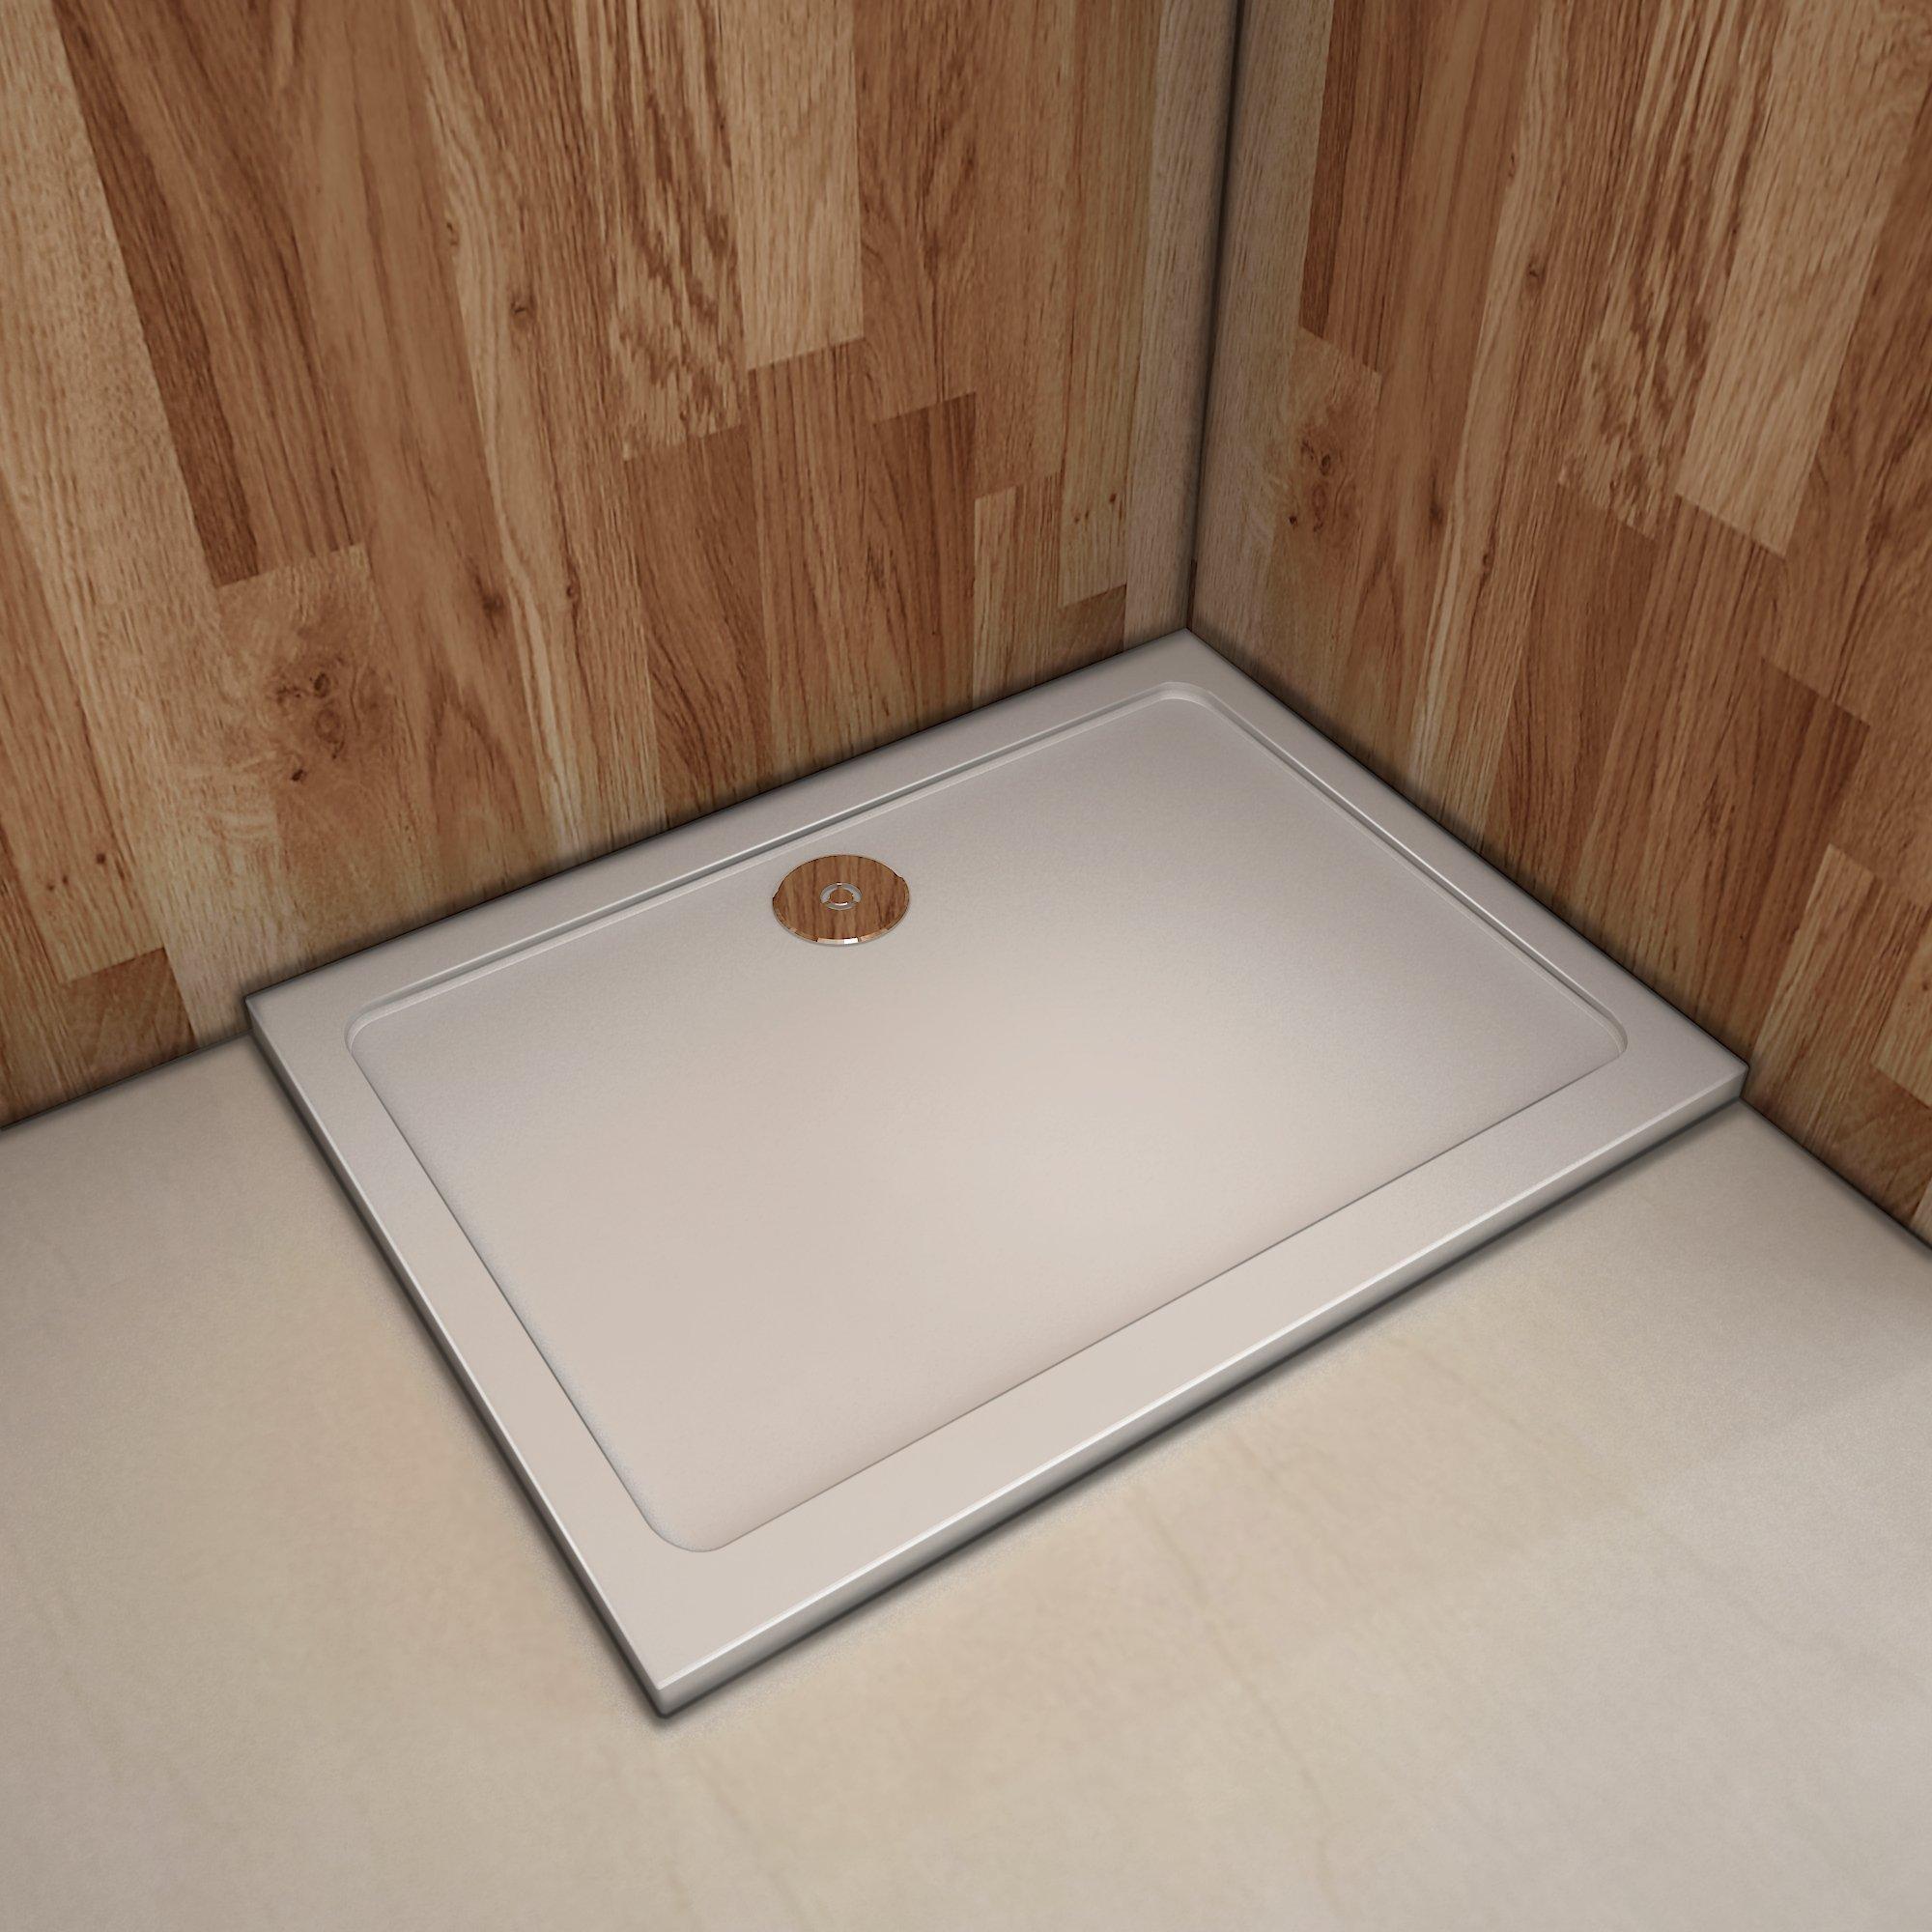 Plato de ducha Resina Blanco, Extraplano, Rectangular 100x80cm: Amazon.es: Bricolaje y herramientas